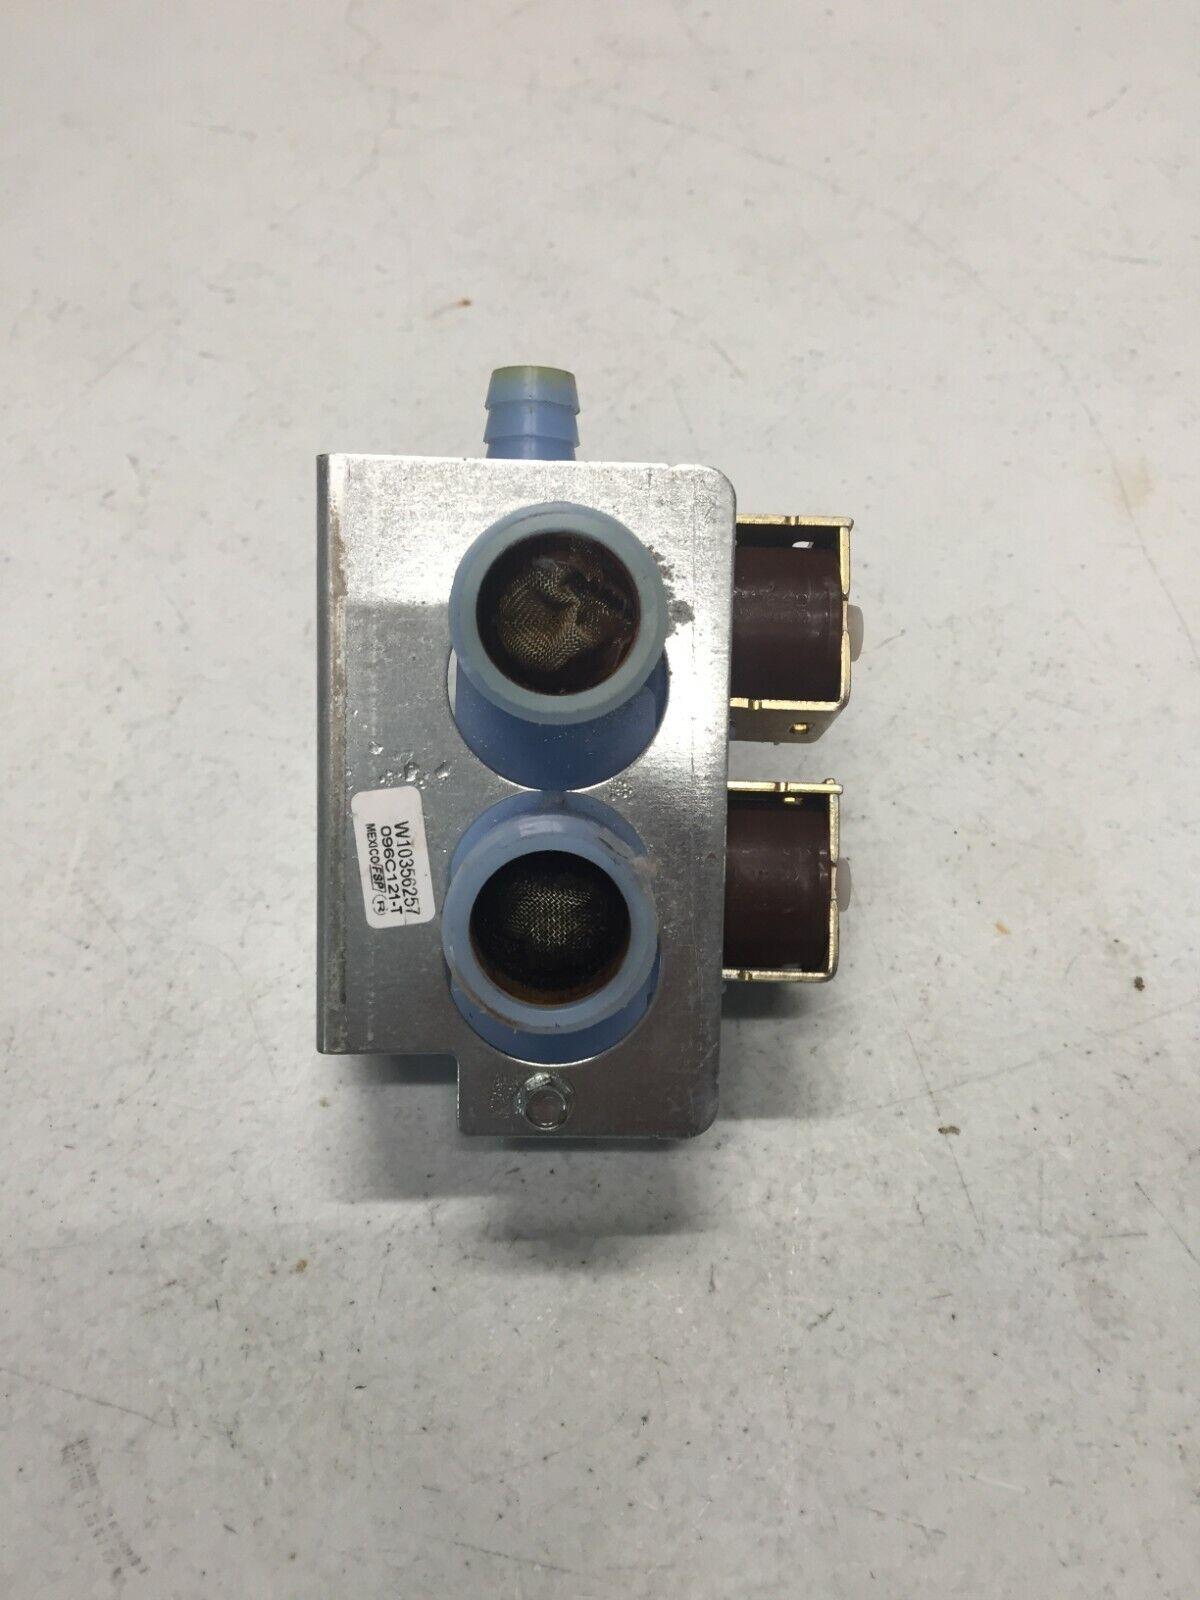 Whirlpool Washer Water Valve W10356257 - $10.00